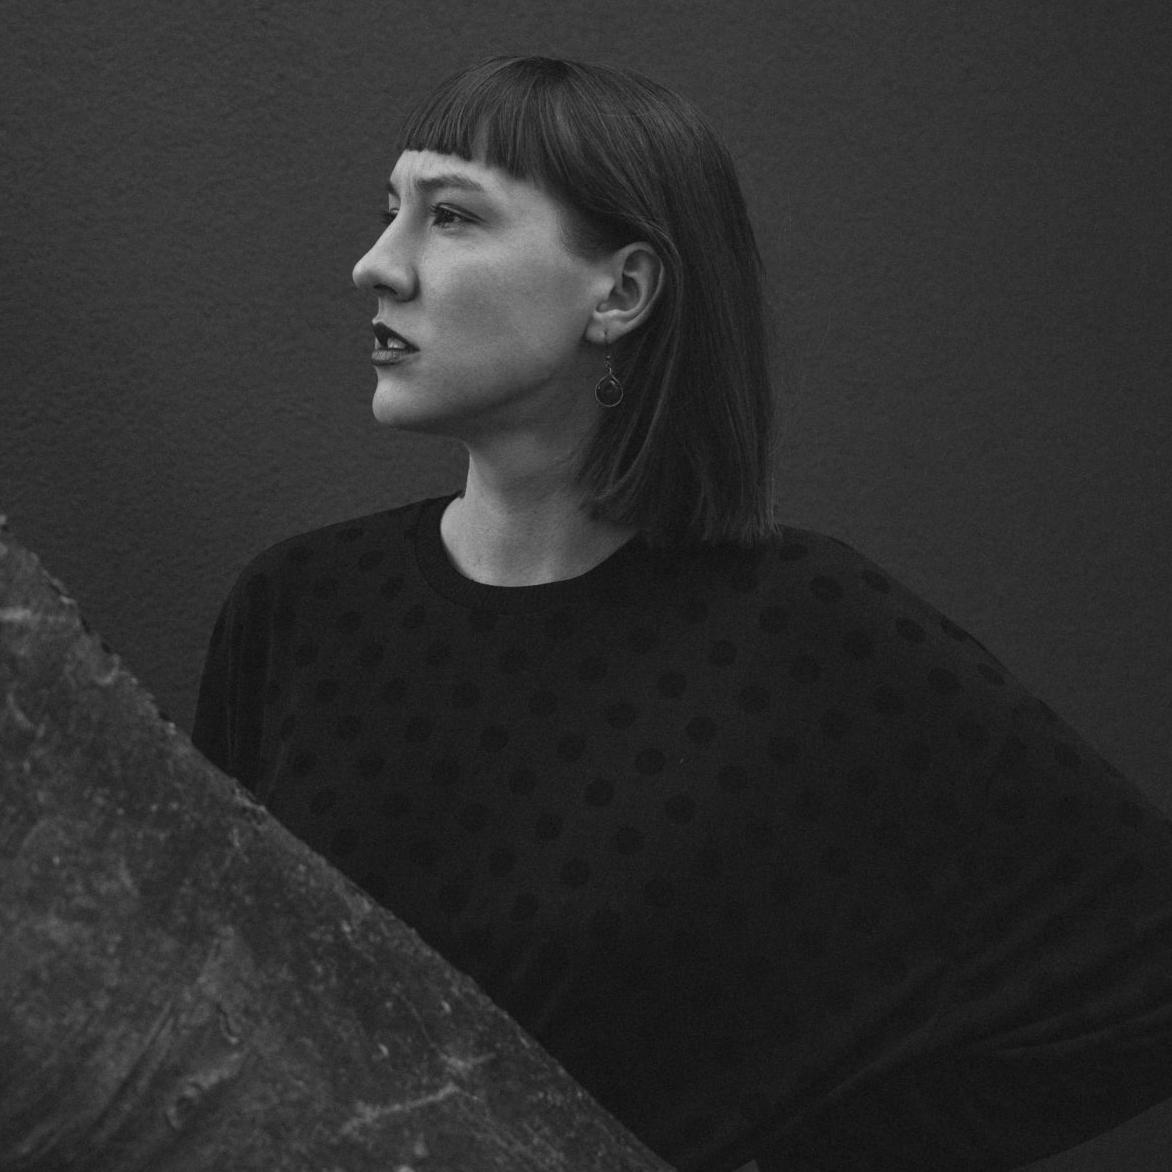 ELLNA_VILUMA_HELLING_Portraits